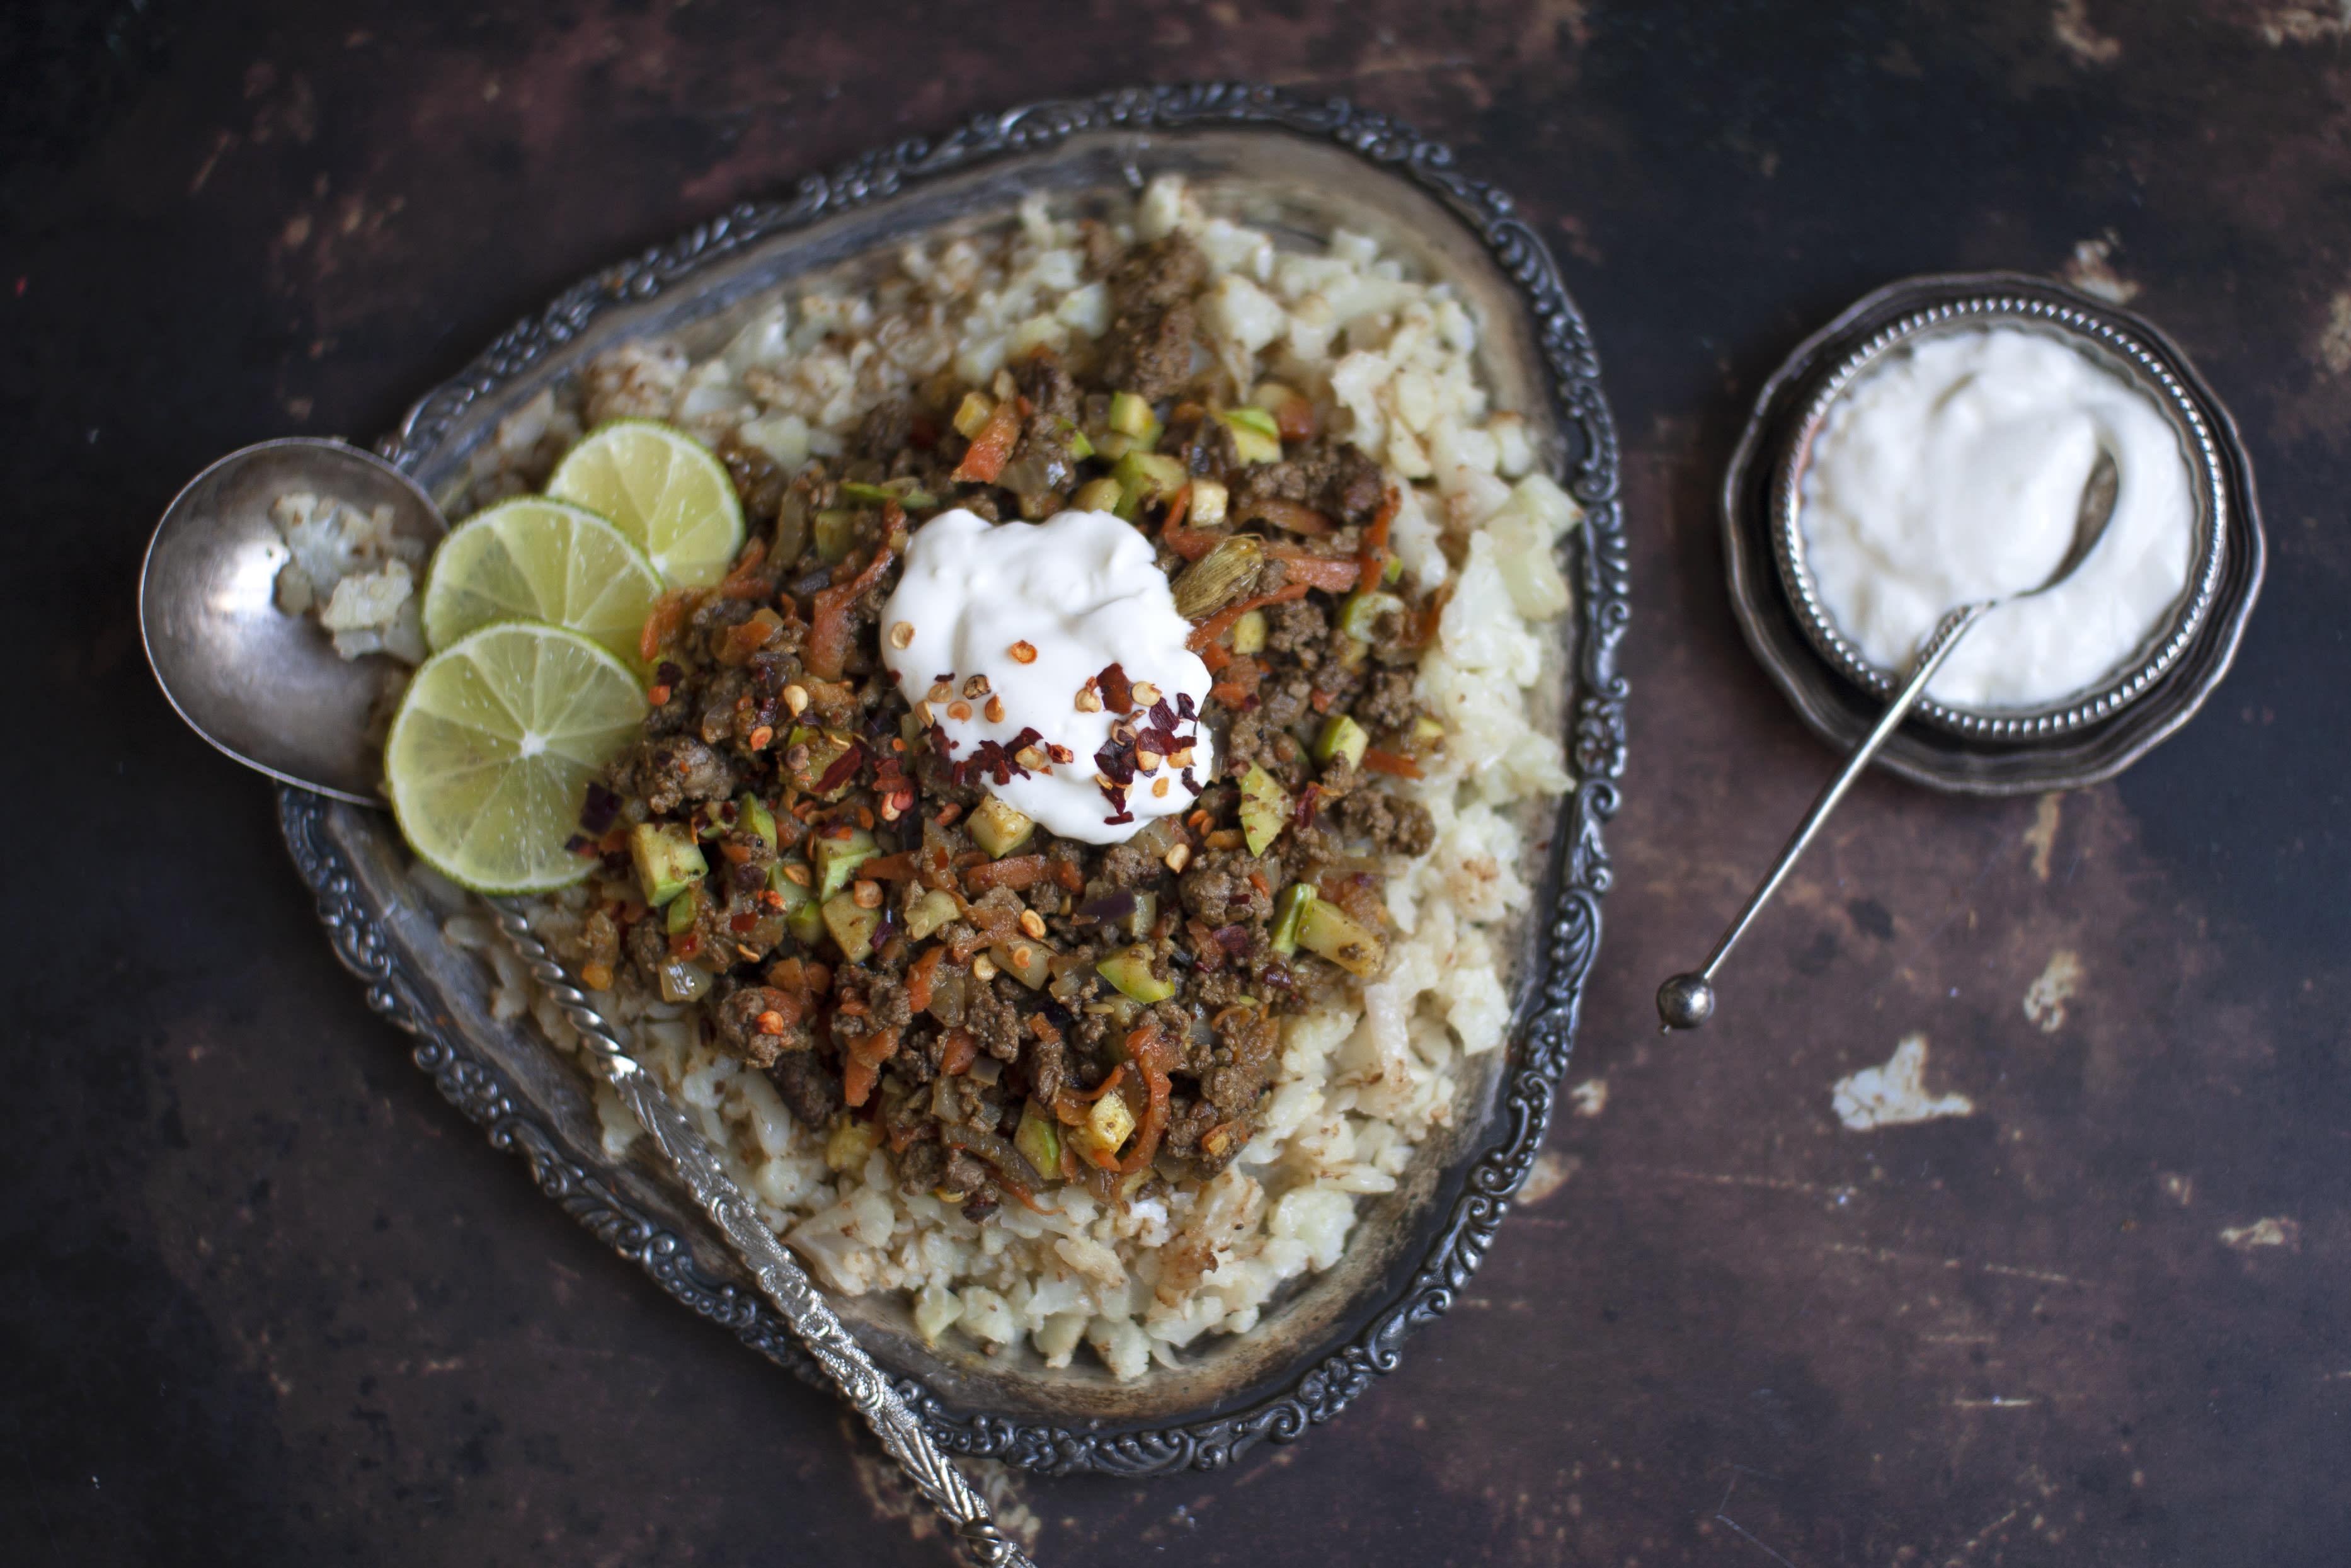 Spicy Indian Beef Mince Qeema with Cauliflower 'Rice'